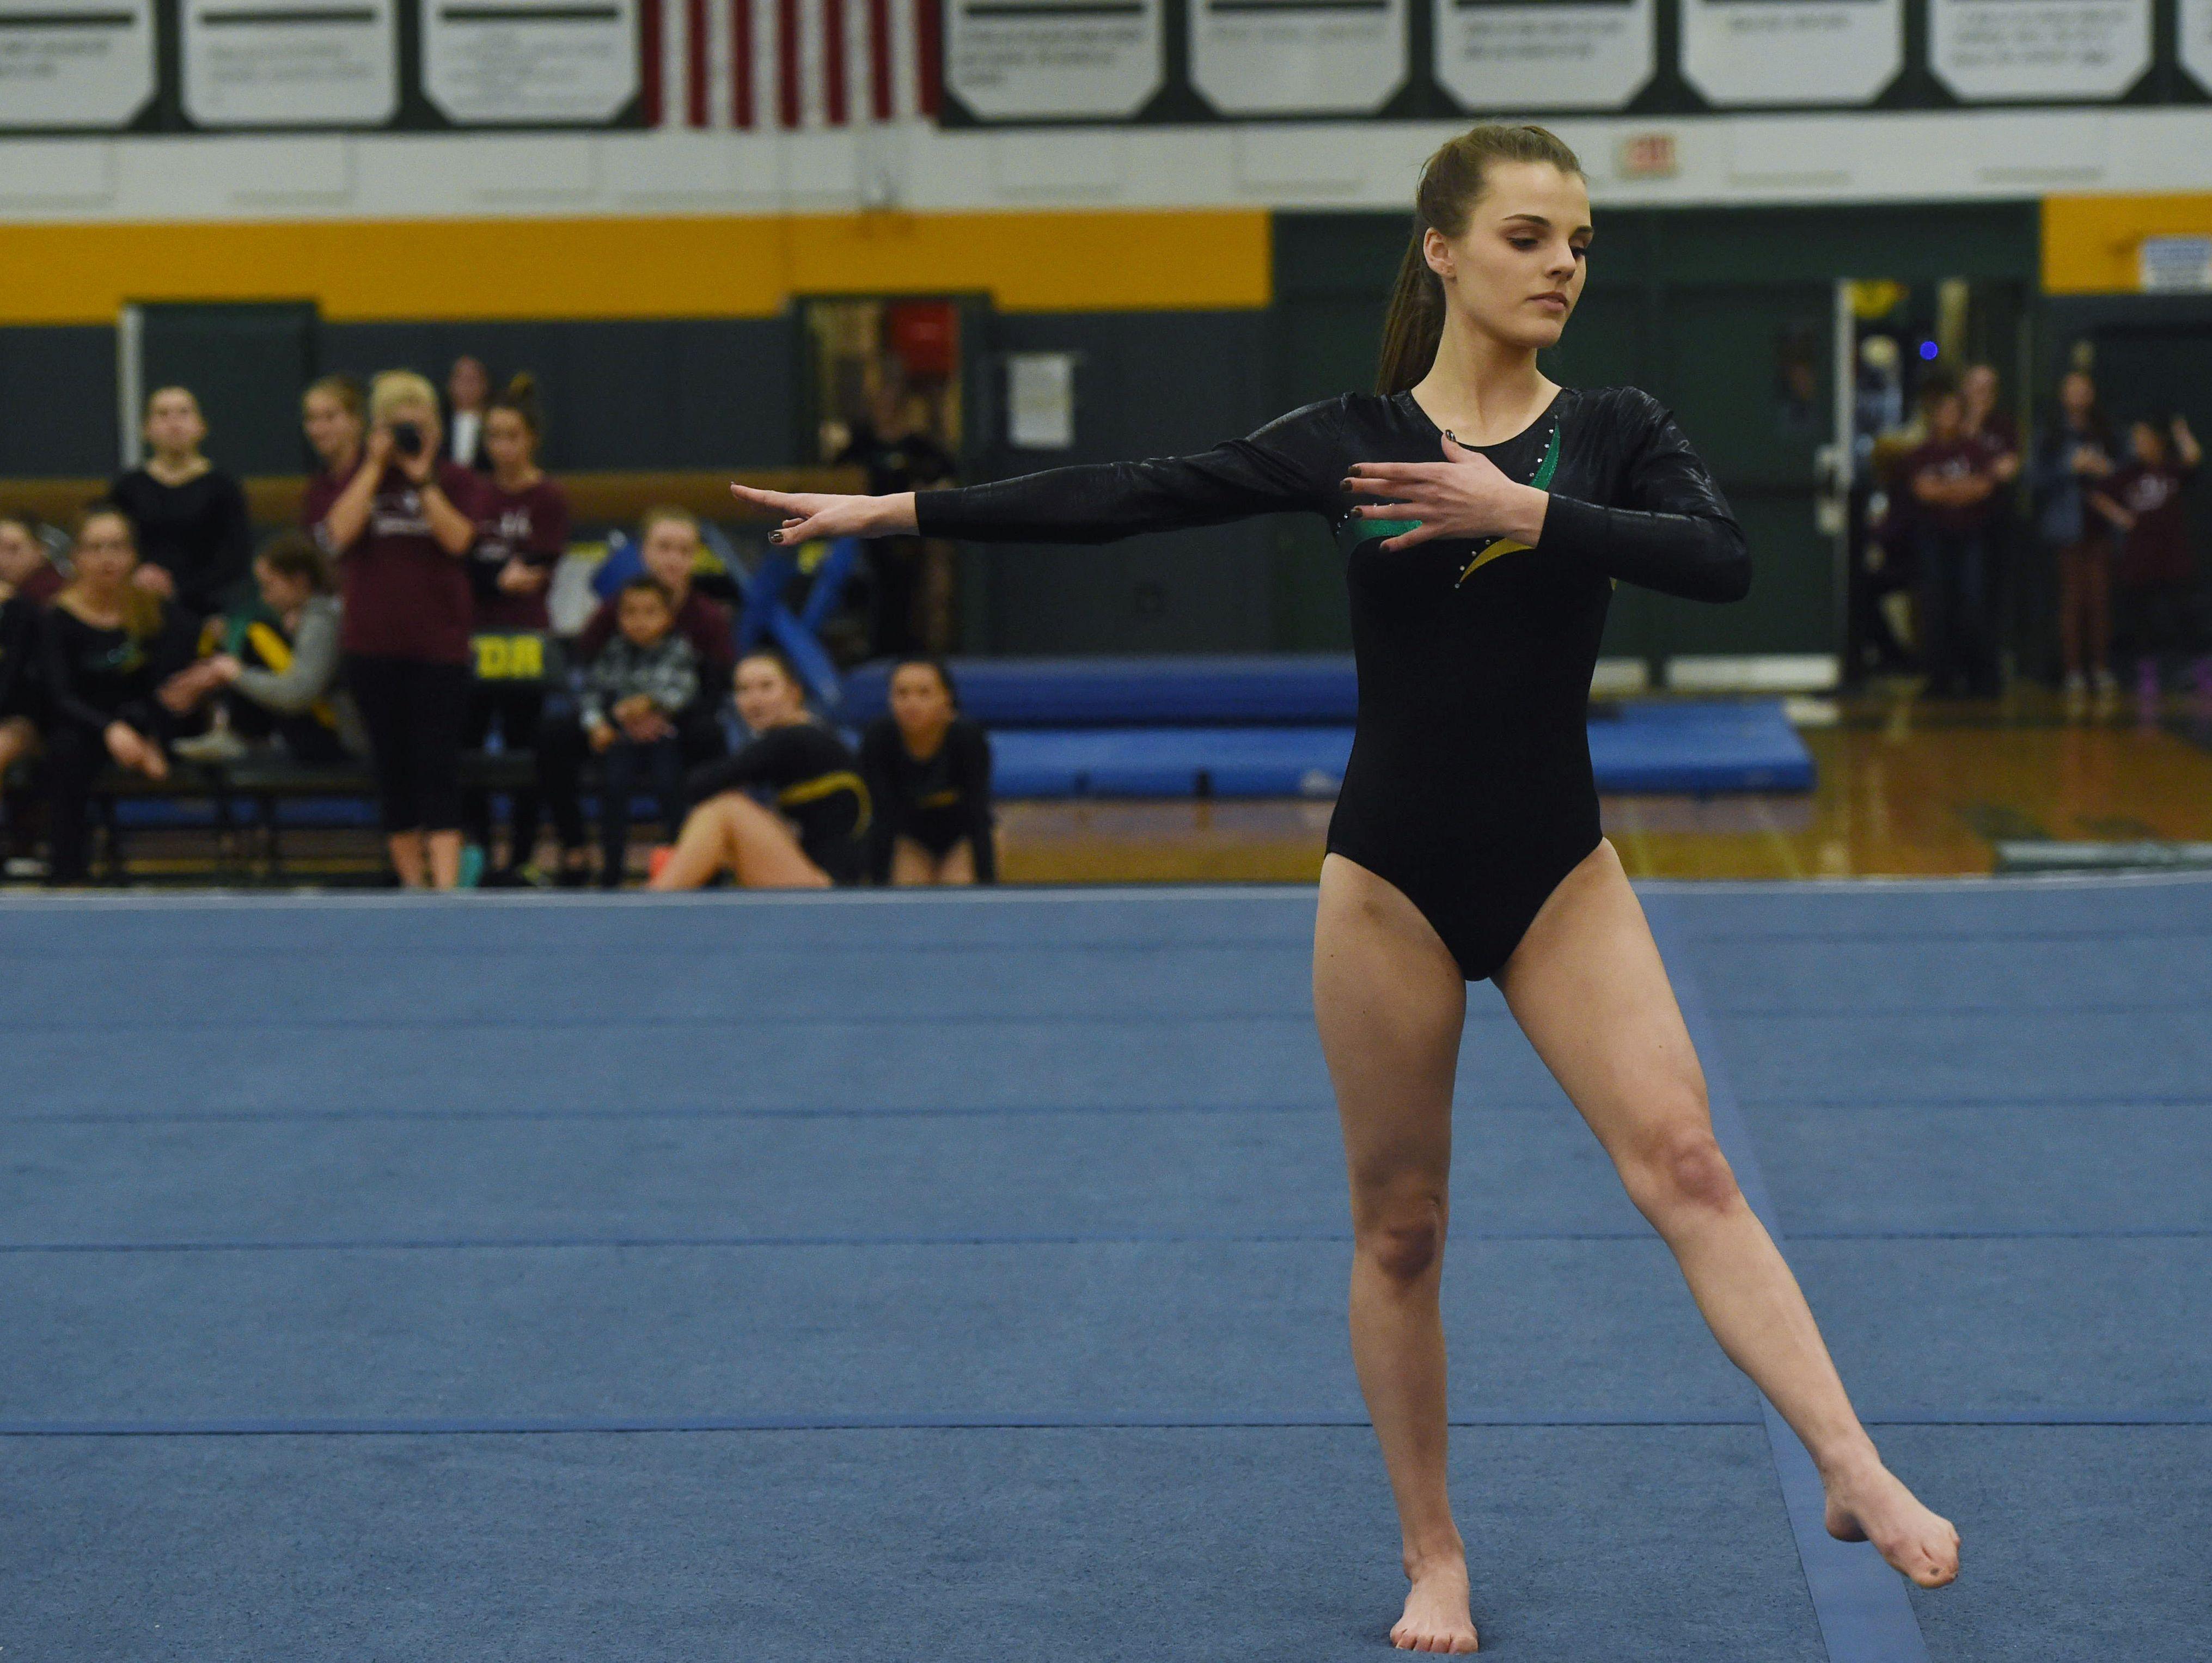 FDR's Nikki Filiberti performs her floor routine during the Katie Filiberti Memorial Gymnastics Invitational at FDR High School.